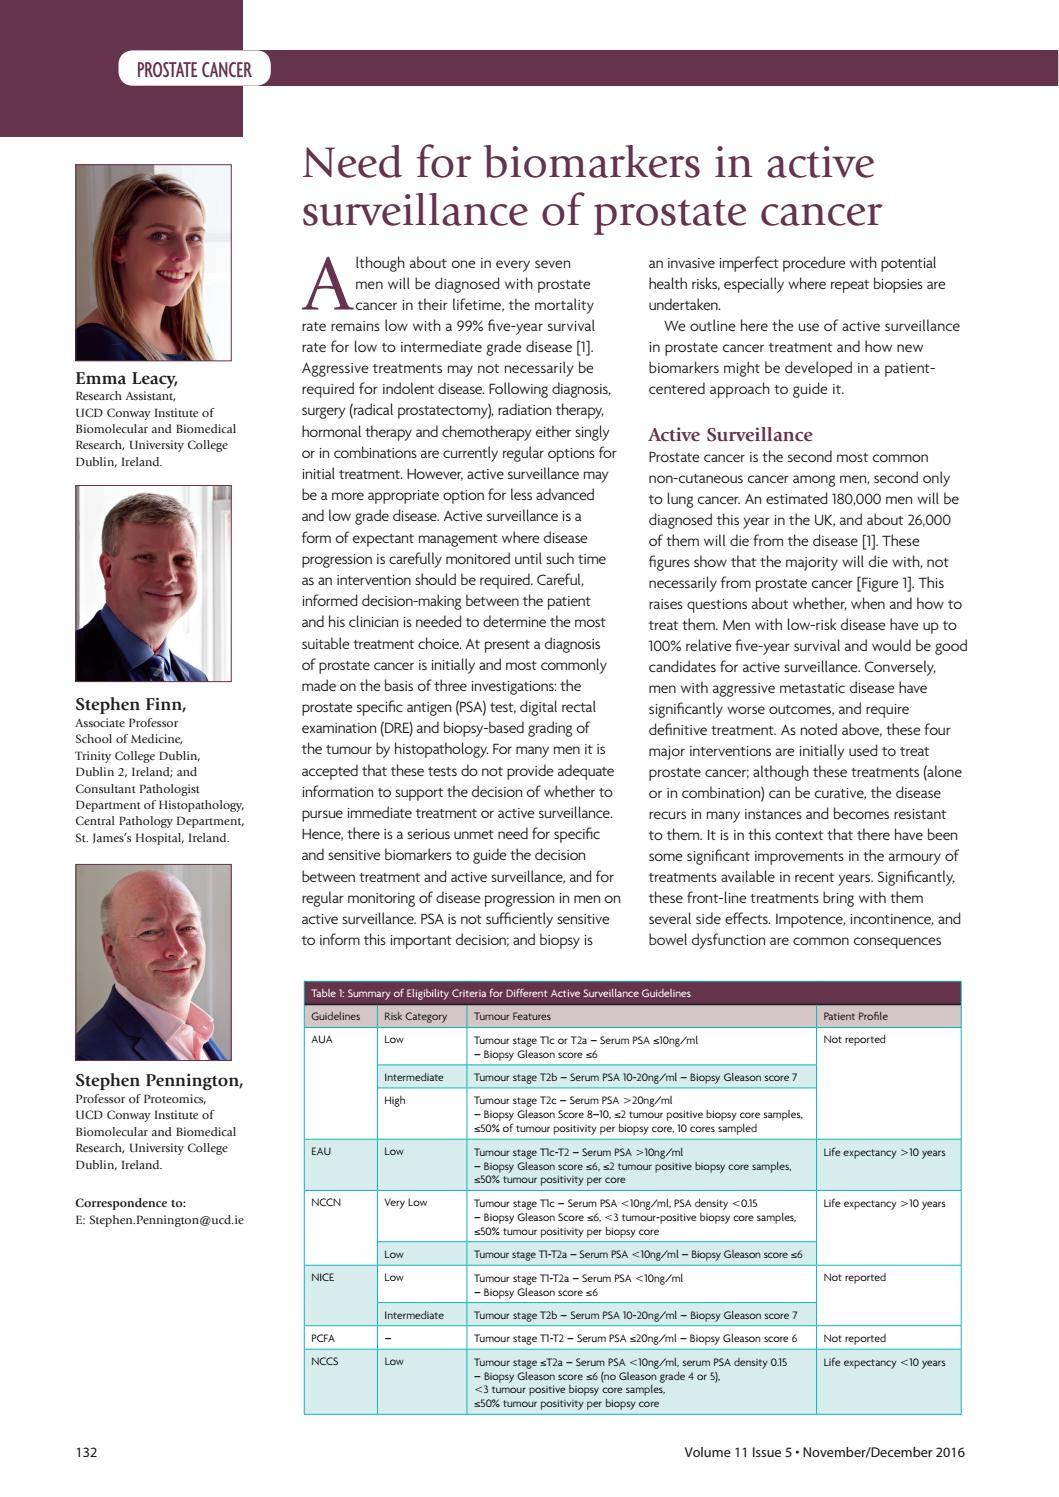 Oncology News November/December 2016